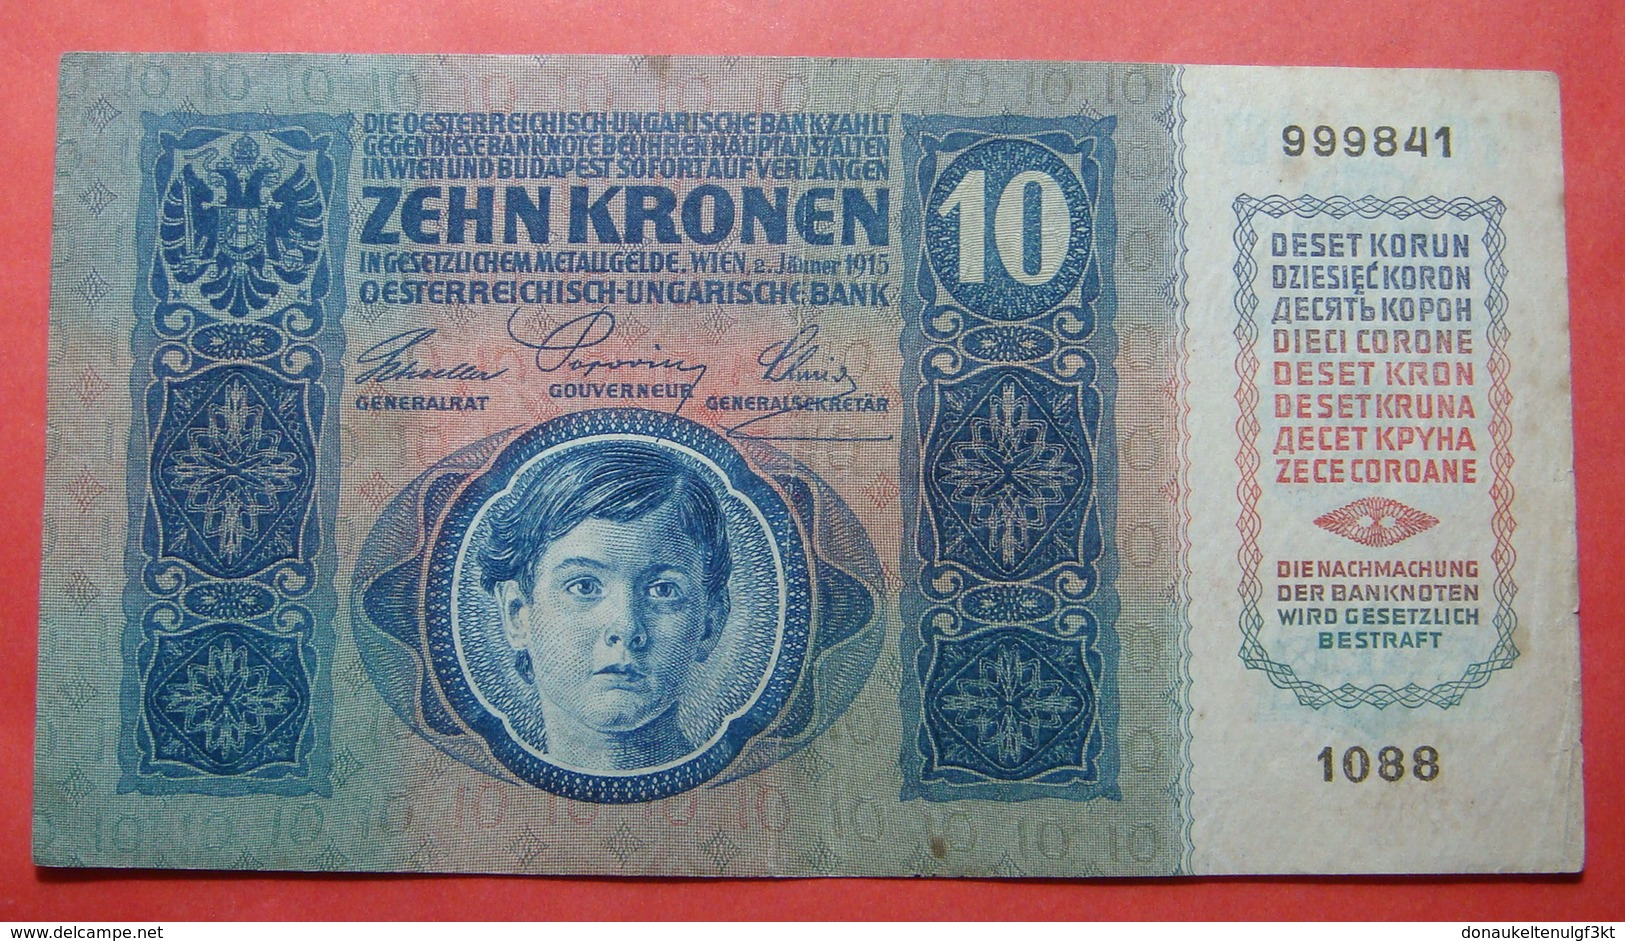 AUSTRIA 10 KRONEN 1915, Serial Number: 999841 - 1088 - Autriche